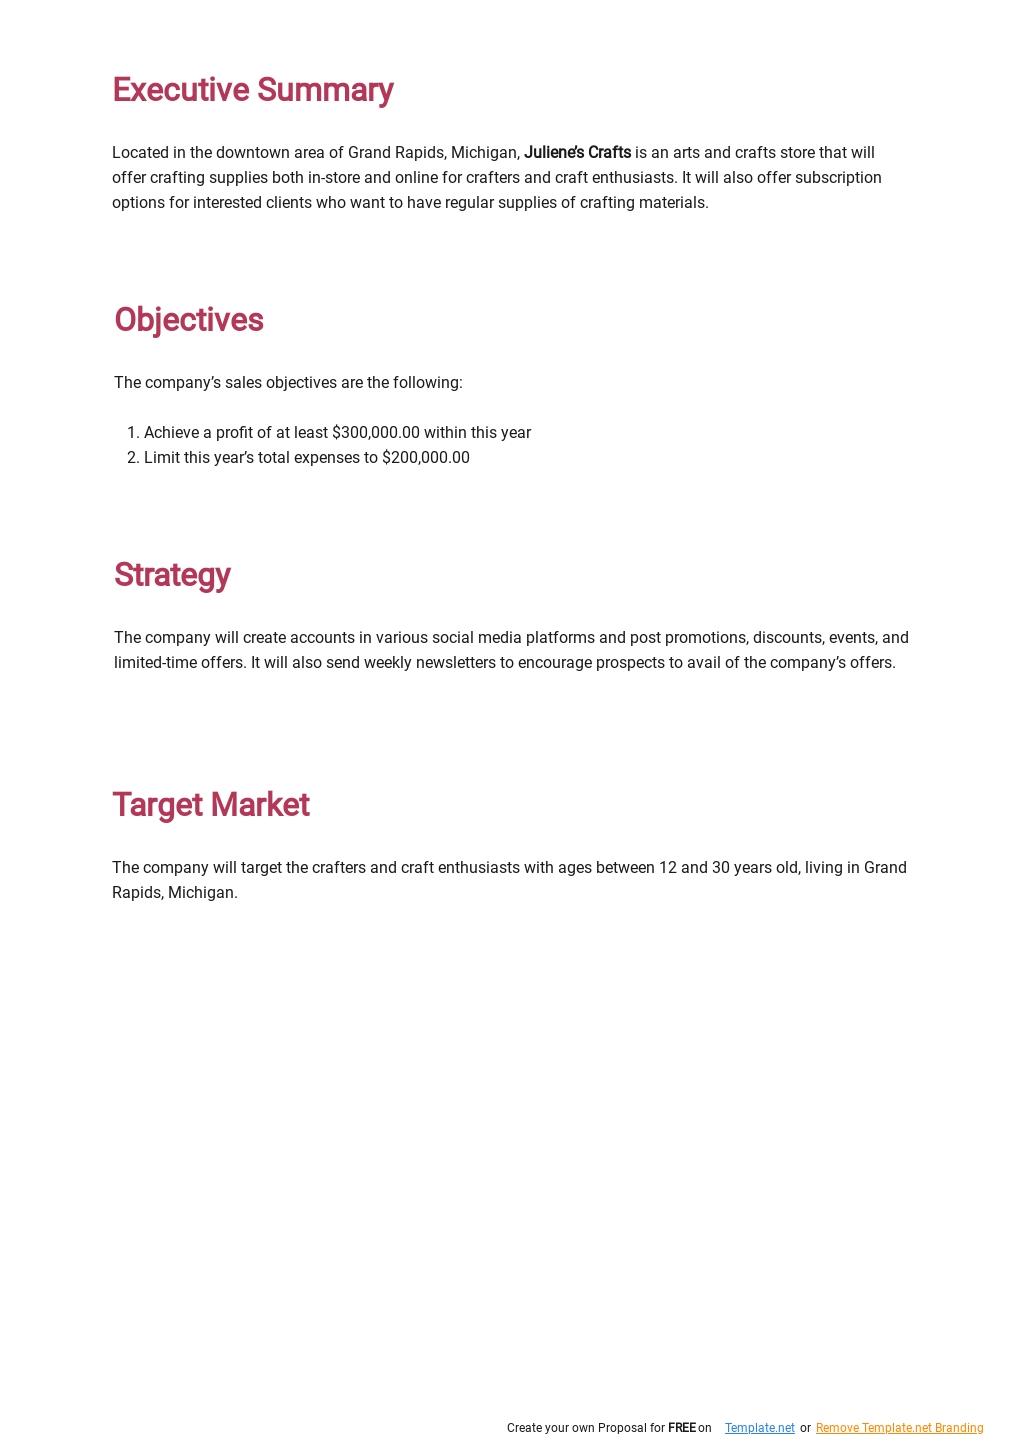 Annual Sales Plan Template [Free PDF] - Google Docs, Word, PDF